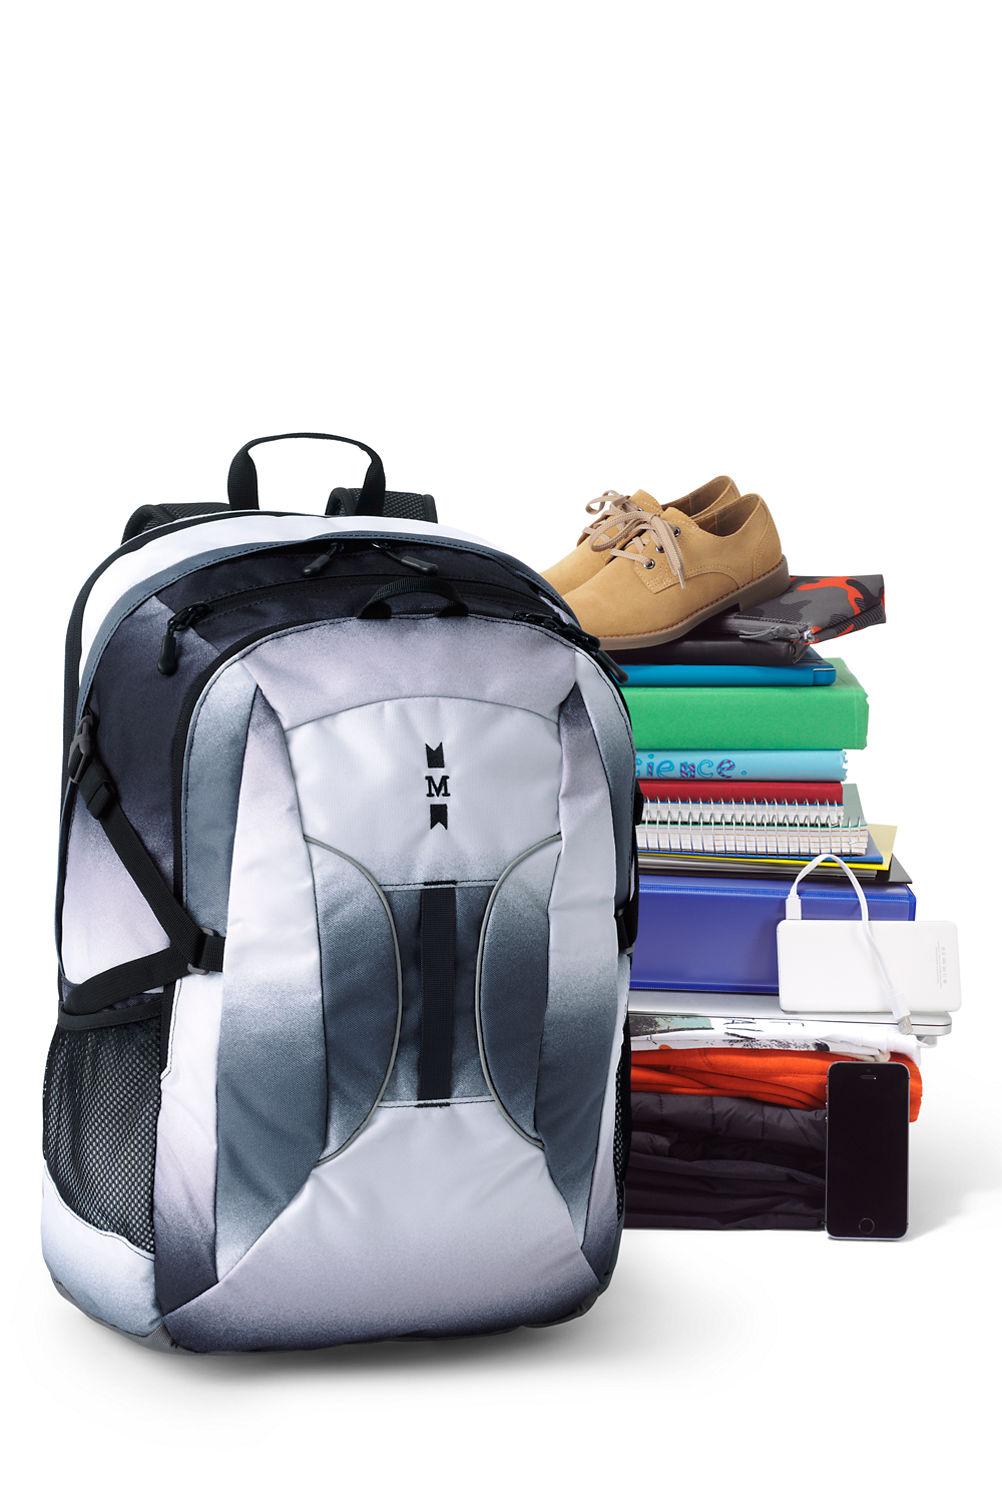 Best Rolling Backpack Nursing School Ceagesp